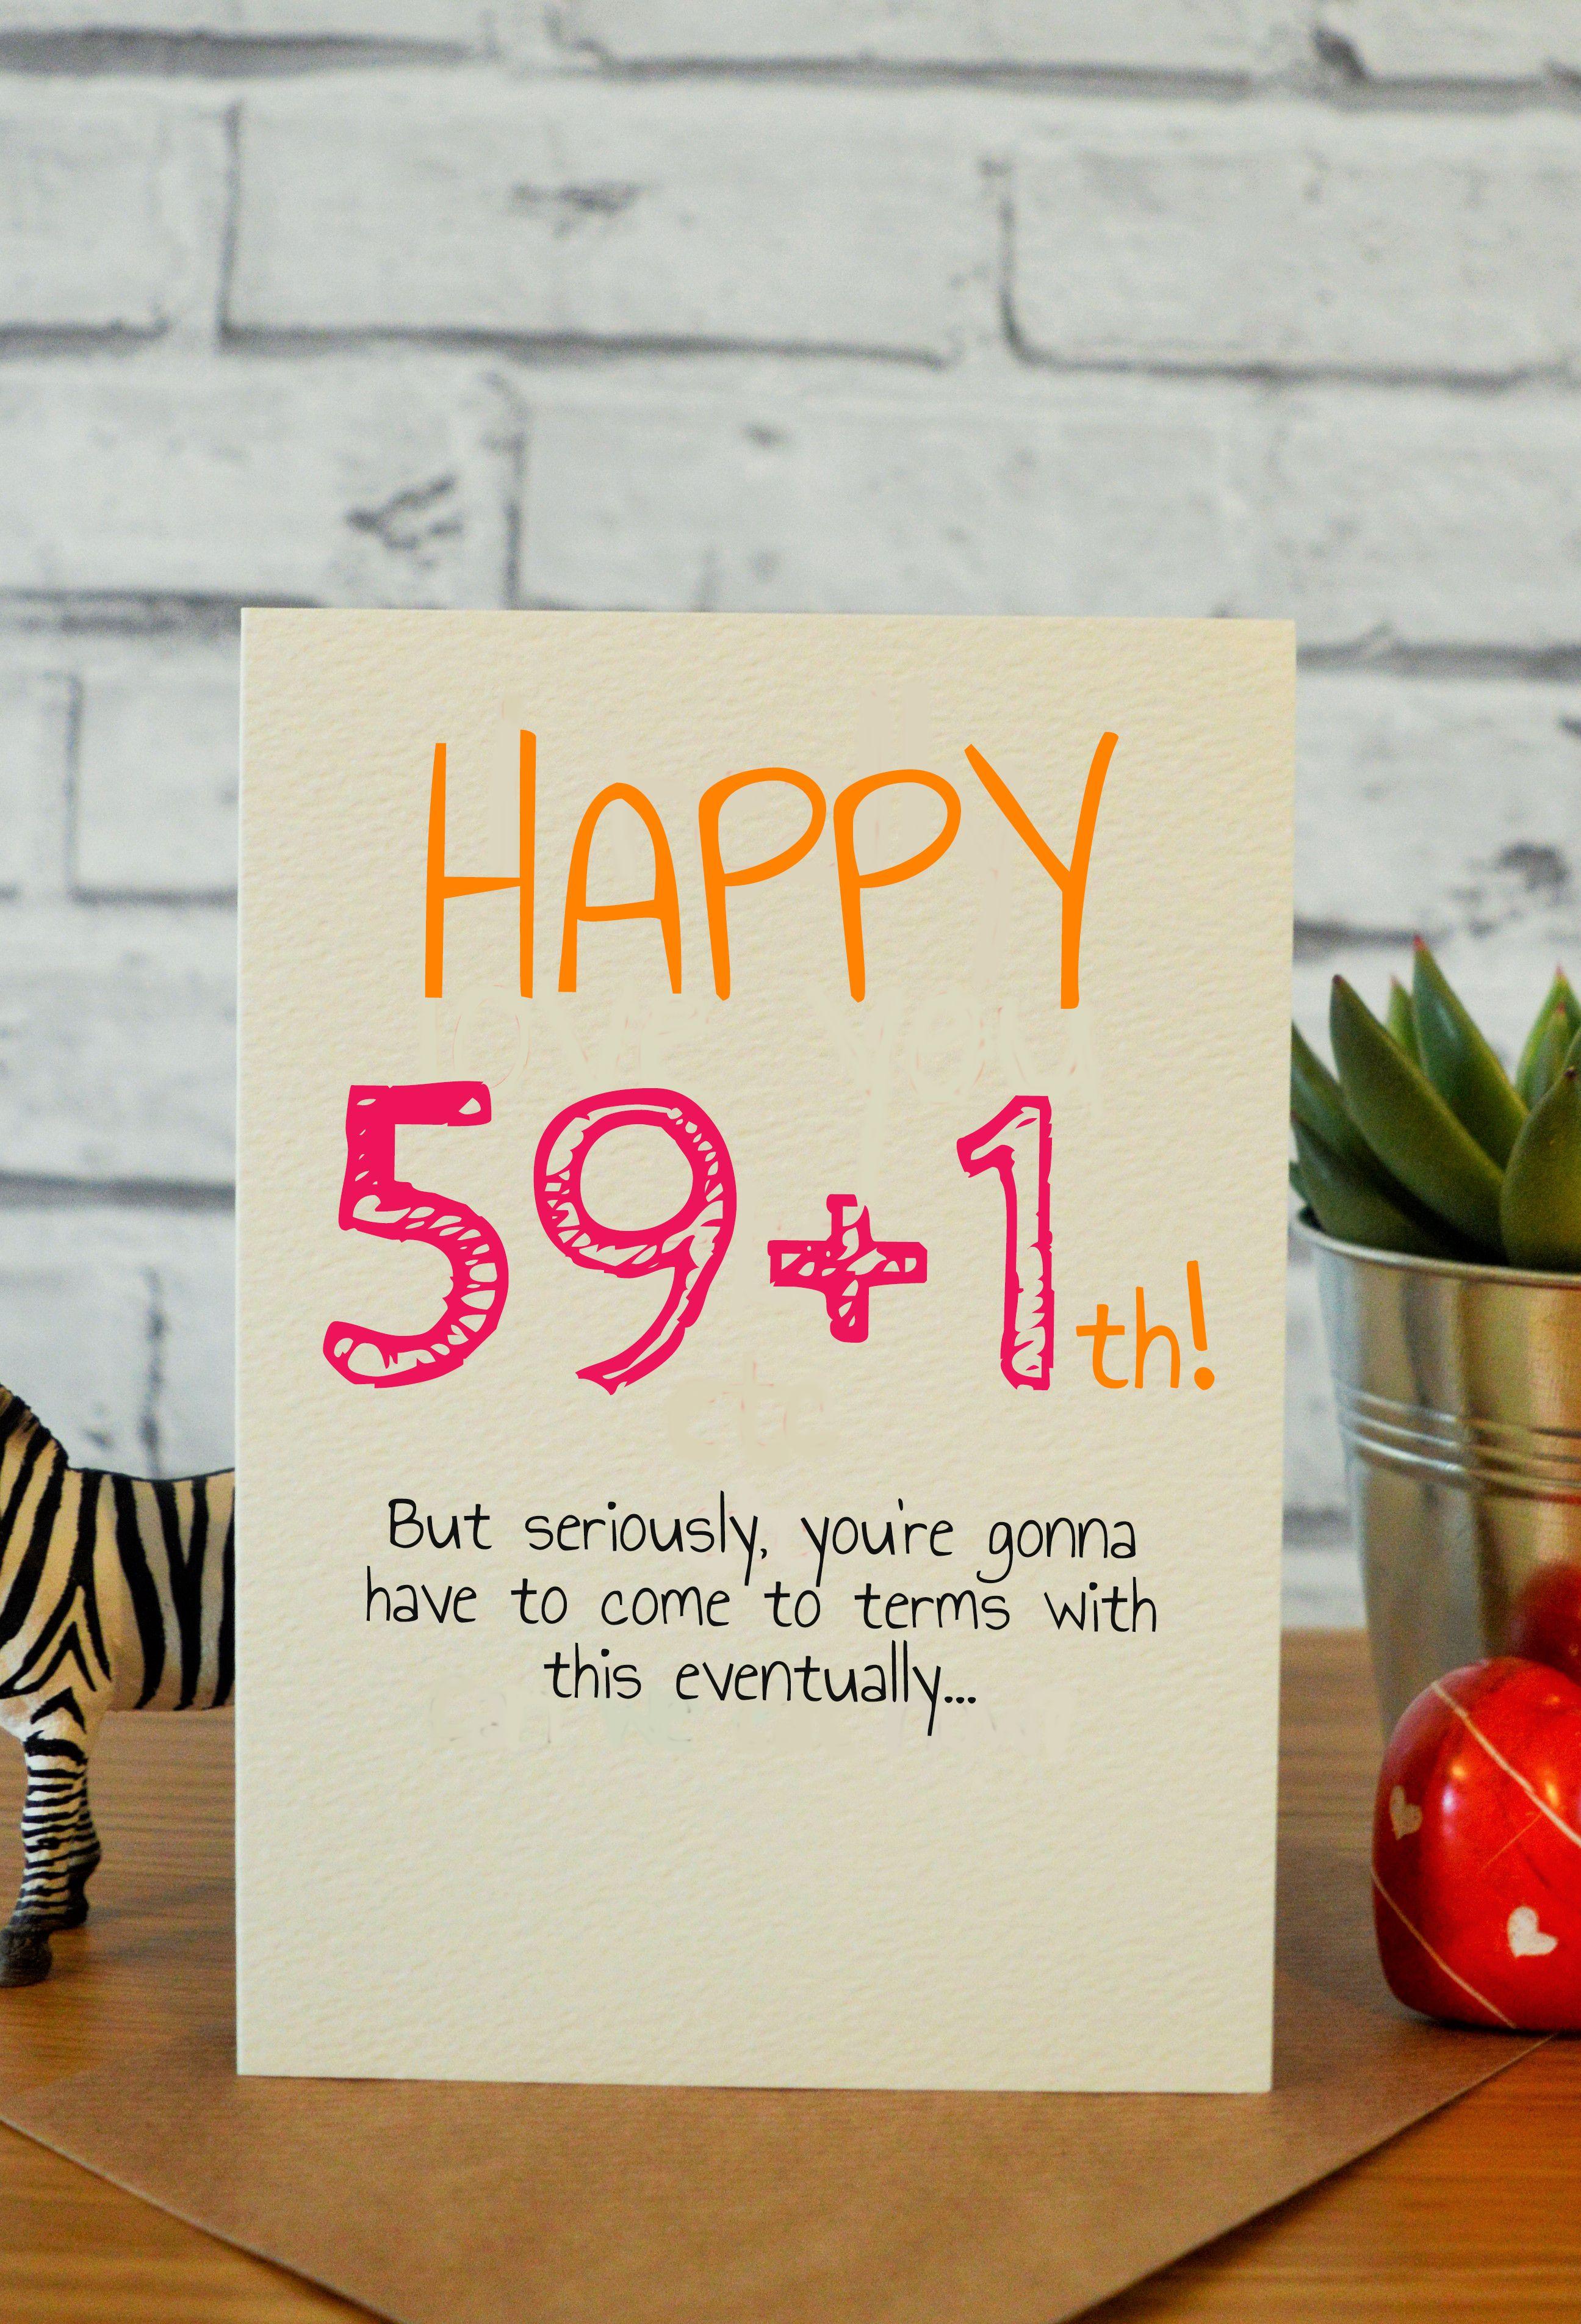 59+1th 60th birthday cards, 40th birthday cards, 30th